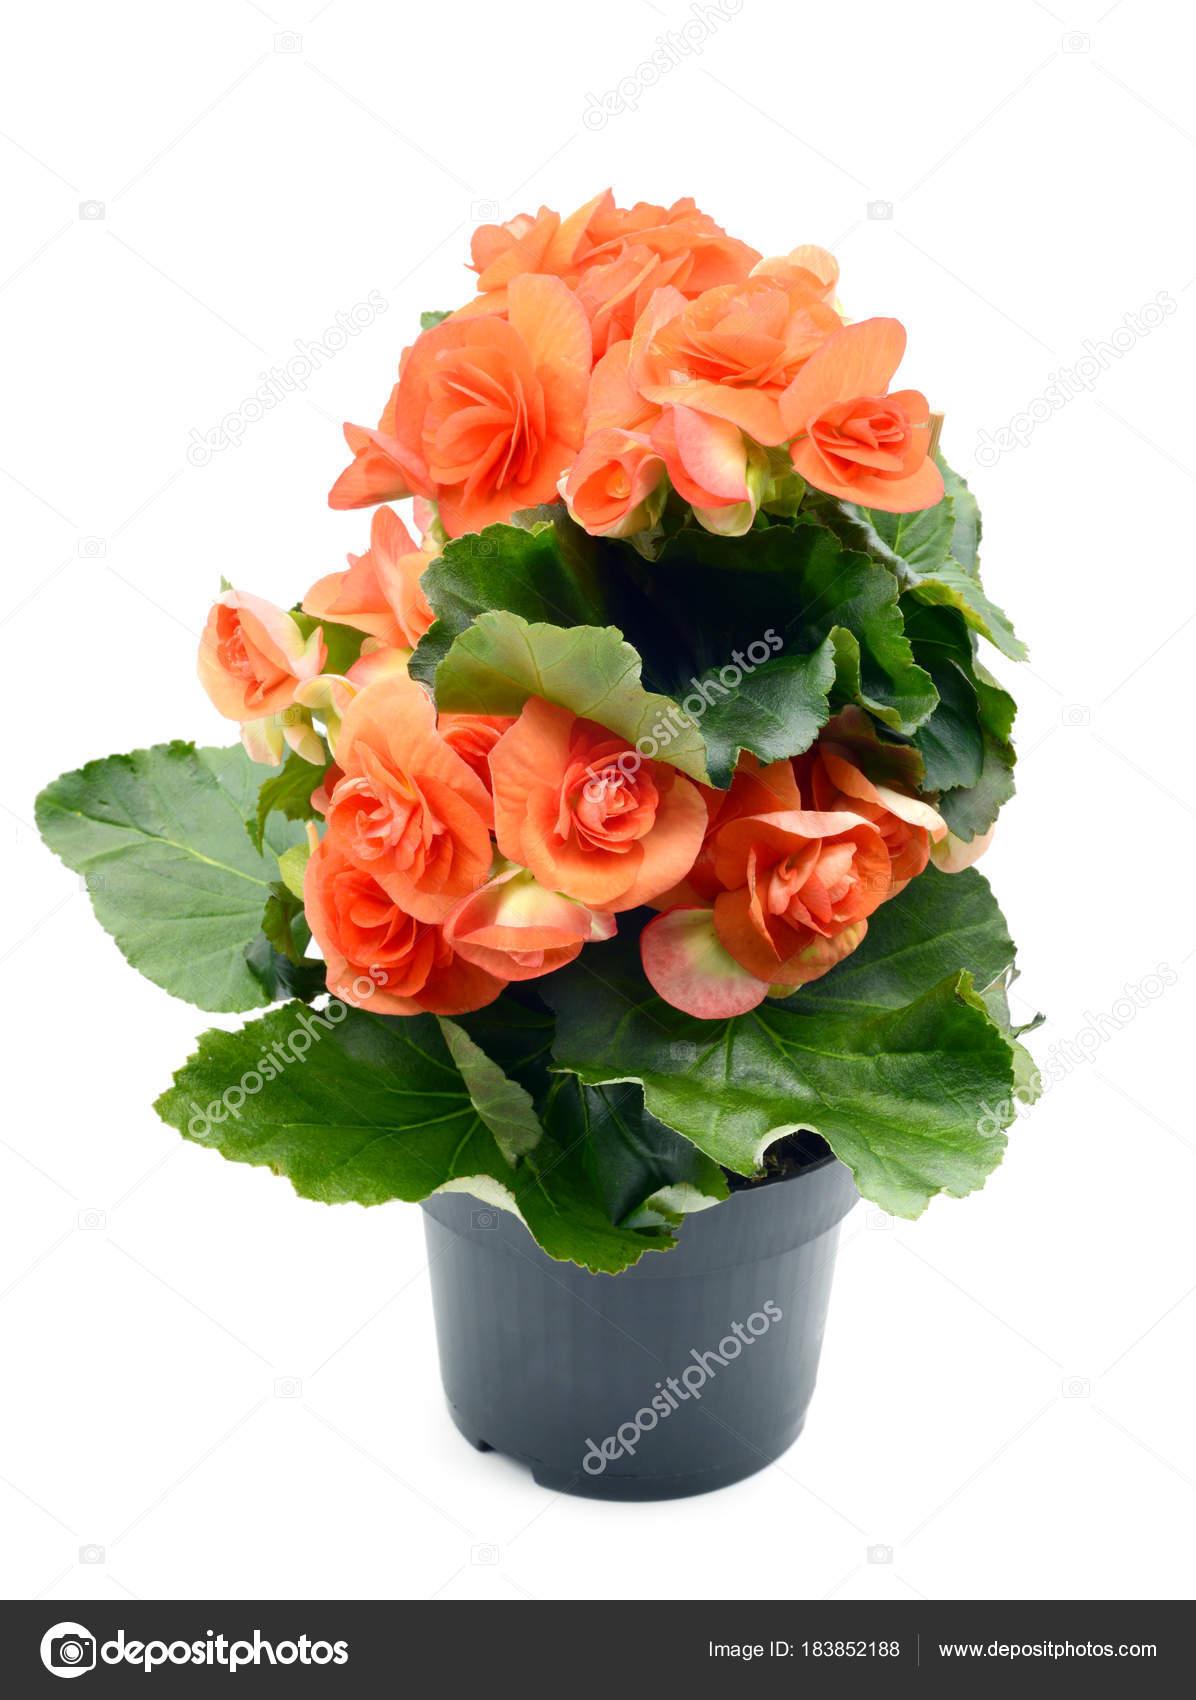 fleur de begonia elatior rouge orange en pot de fleurs blanc isol photographie lcrms7. Black Bedroom Furniture Sets. Home Design Ideas